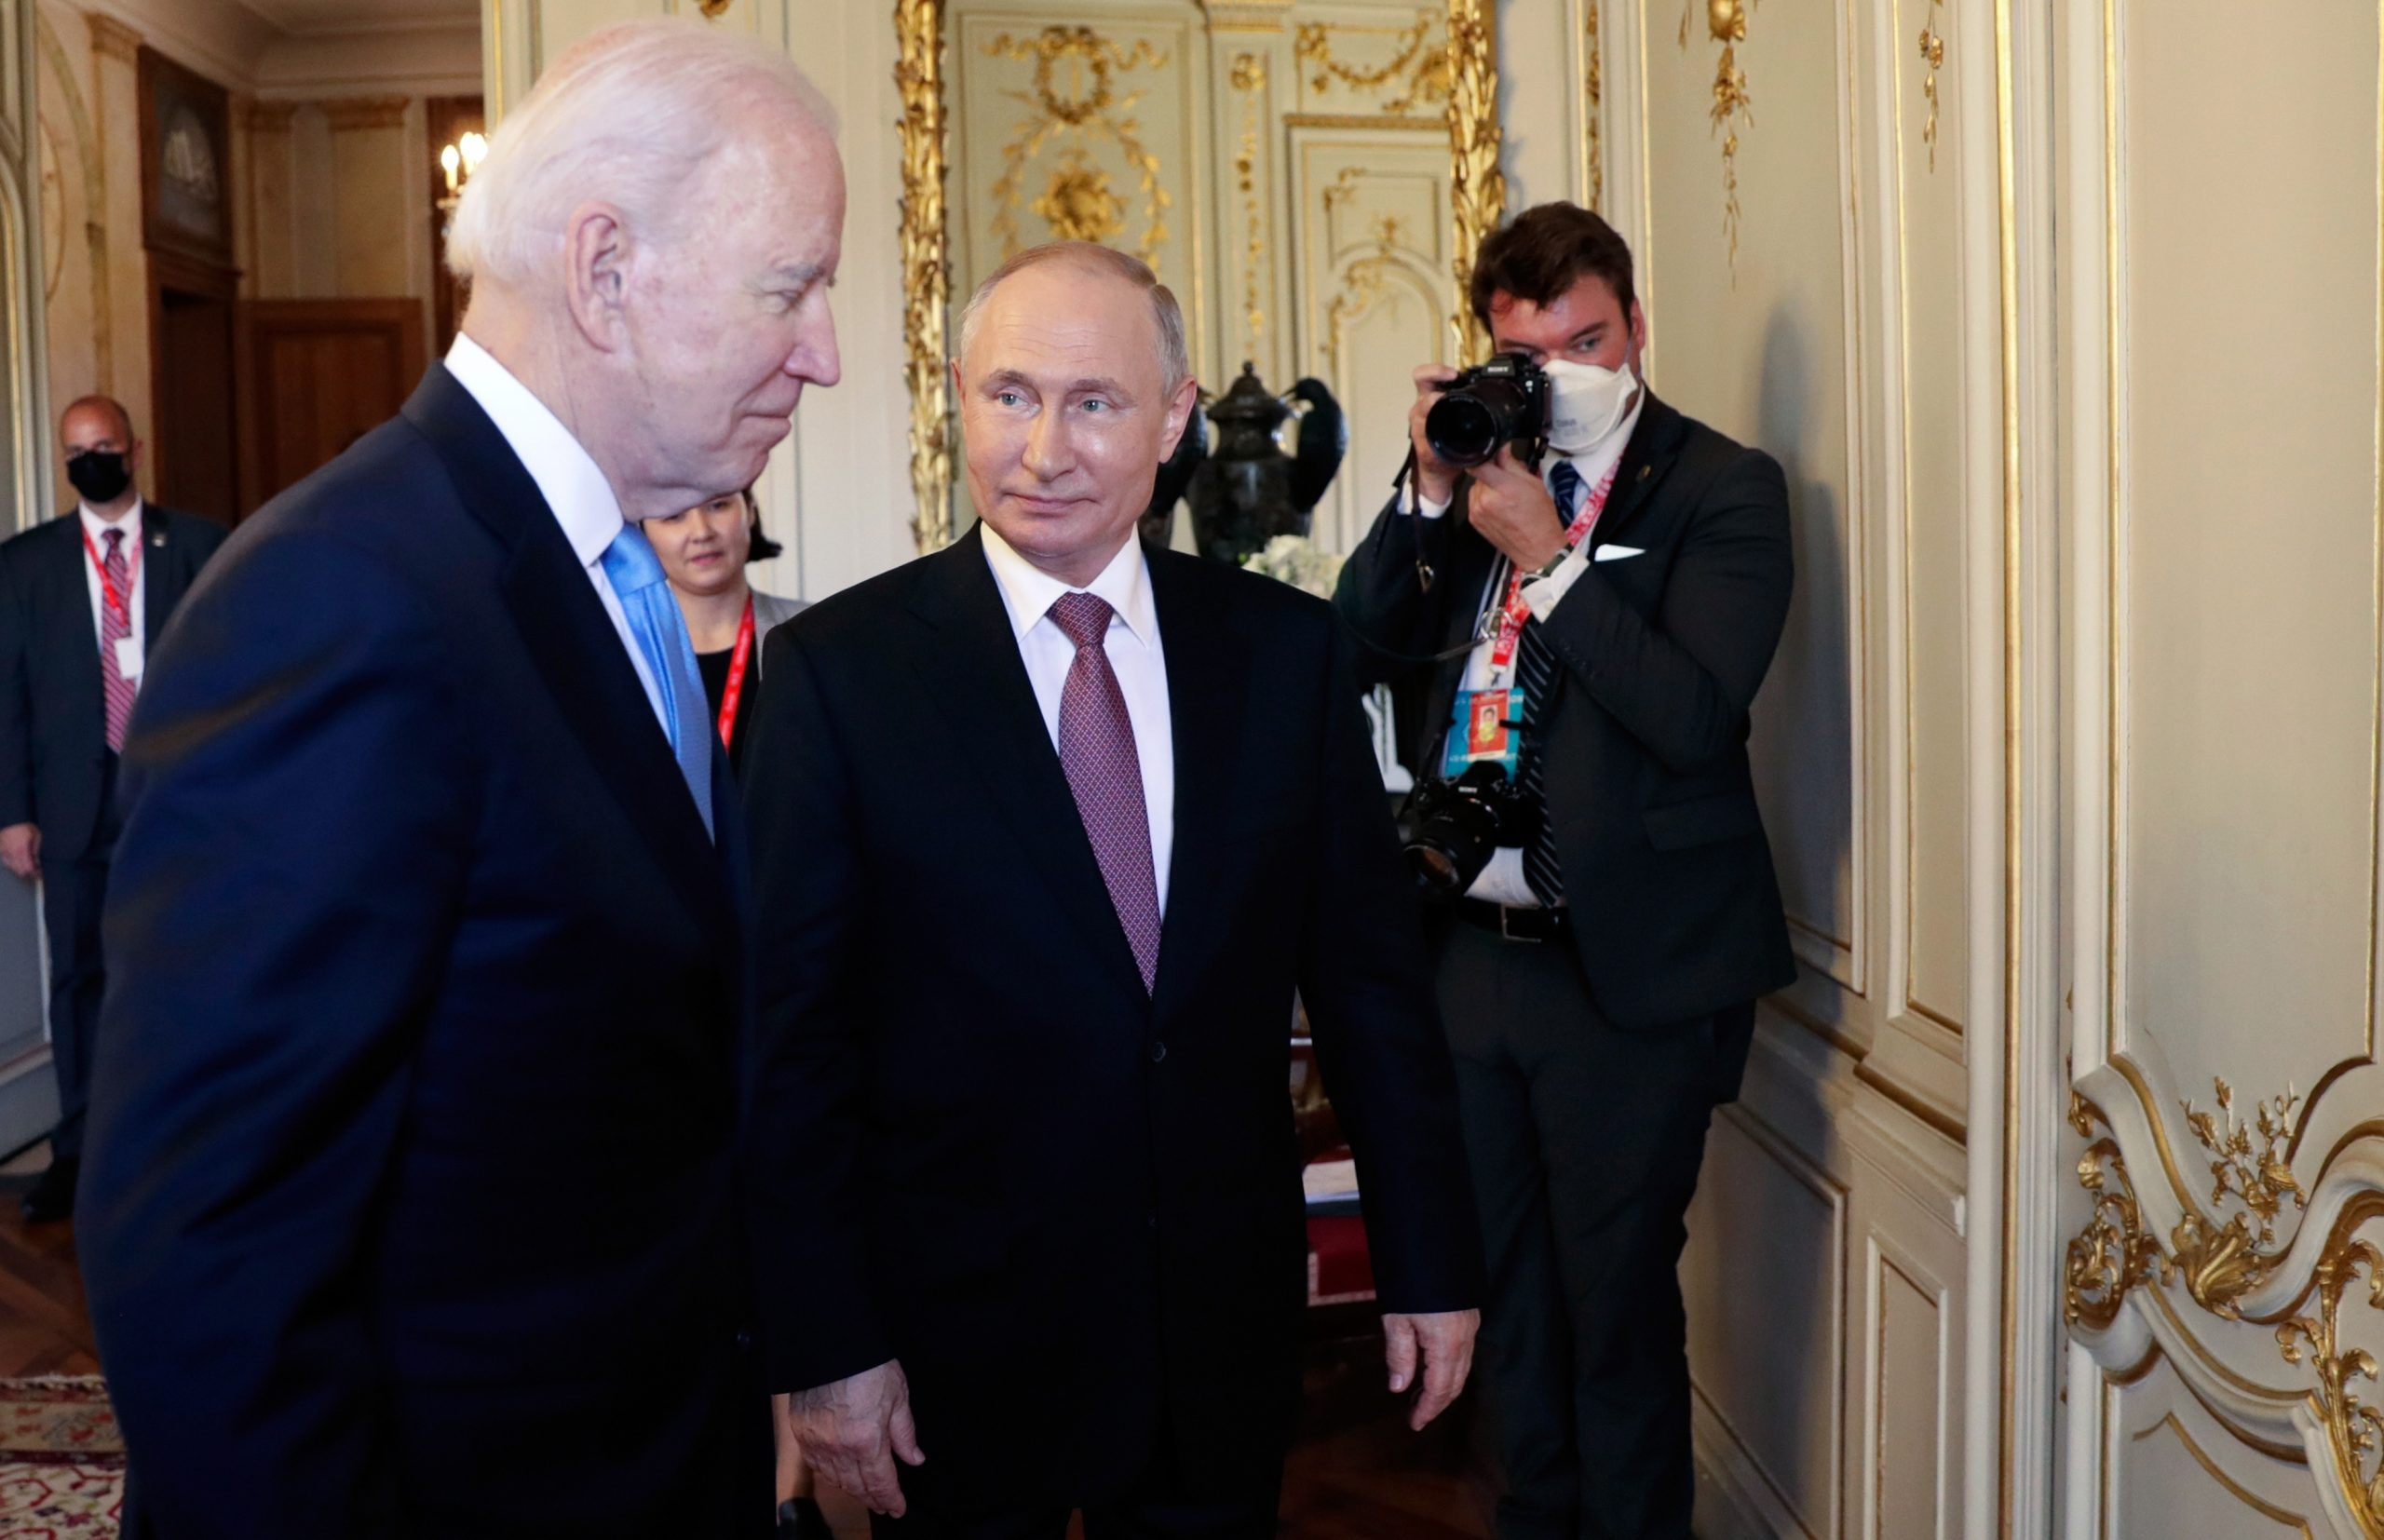 Biden tells Putin certain cyber-attacks should be 'off-limits'